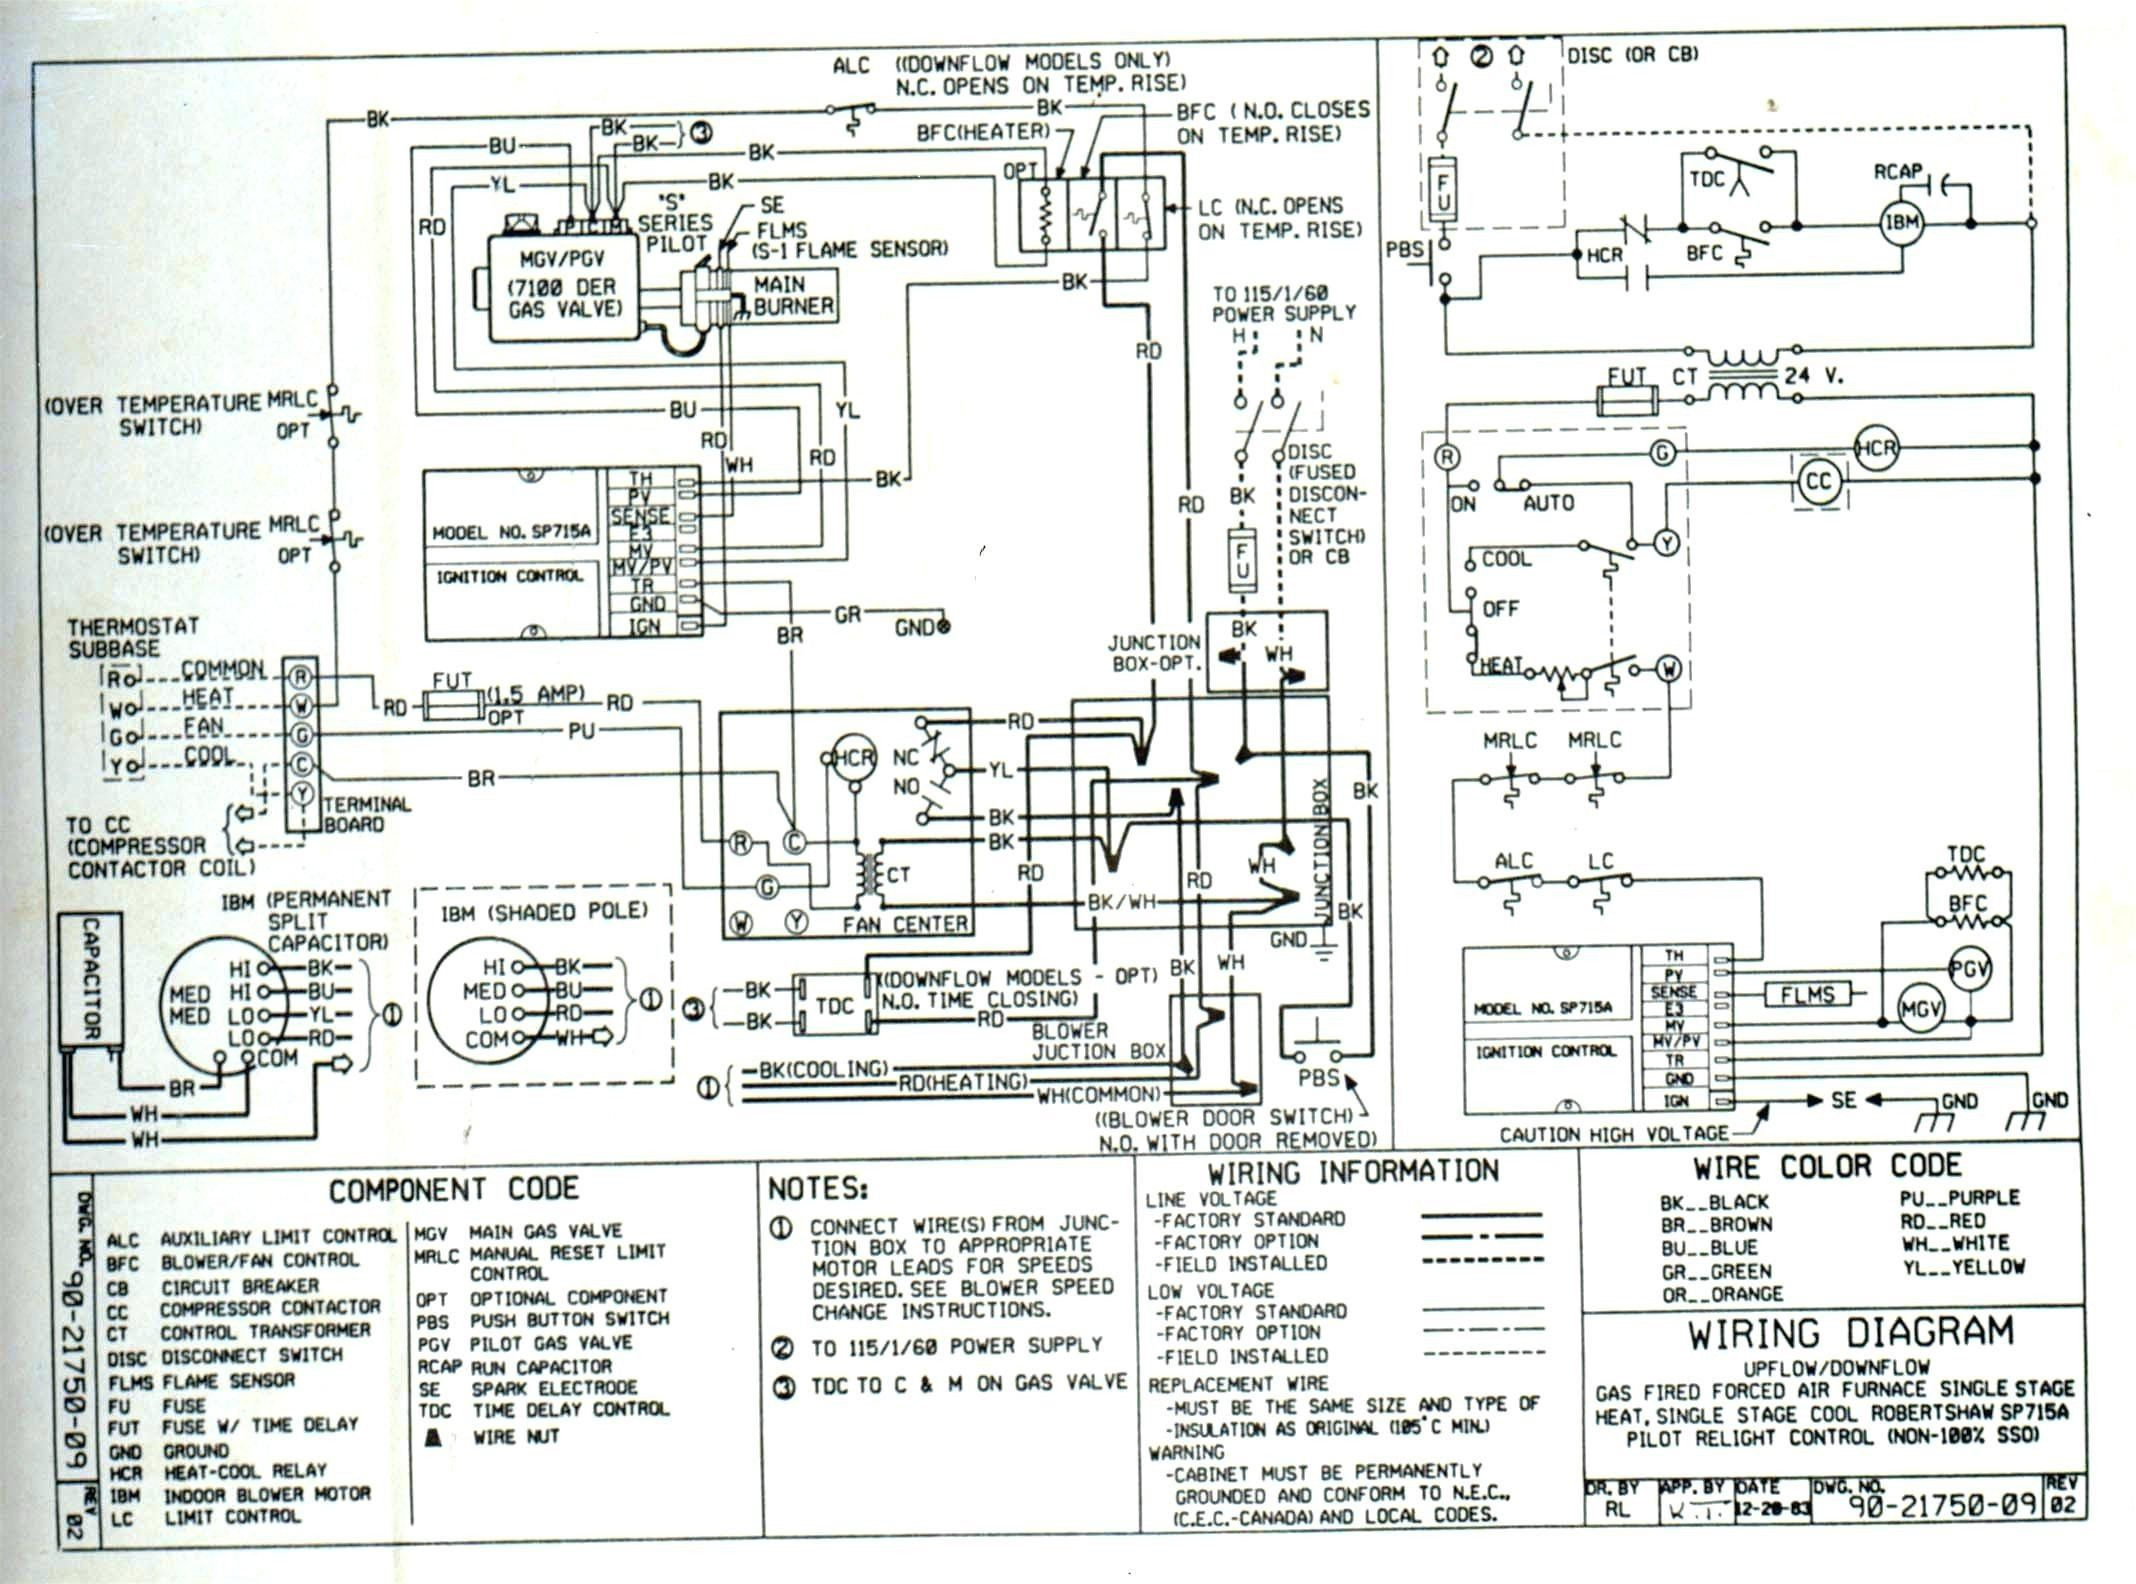 Unique Trane Heat Pump thermostat Wiring Diagram in 2020